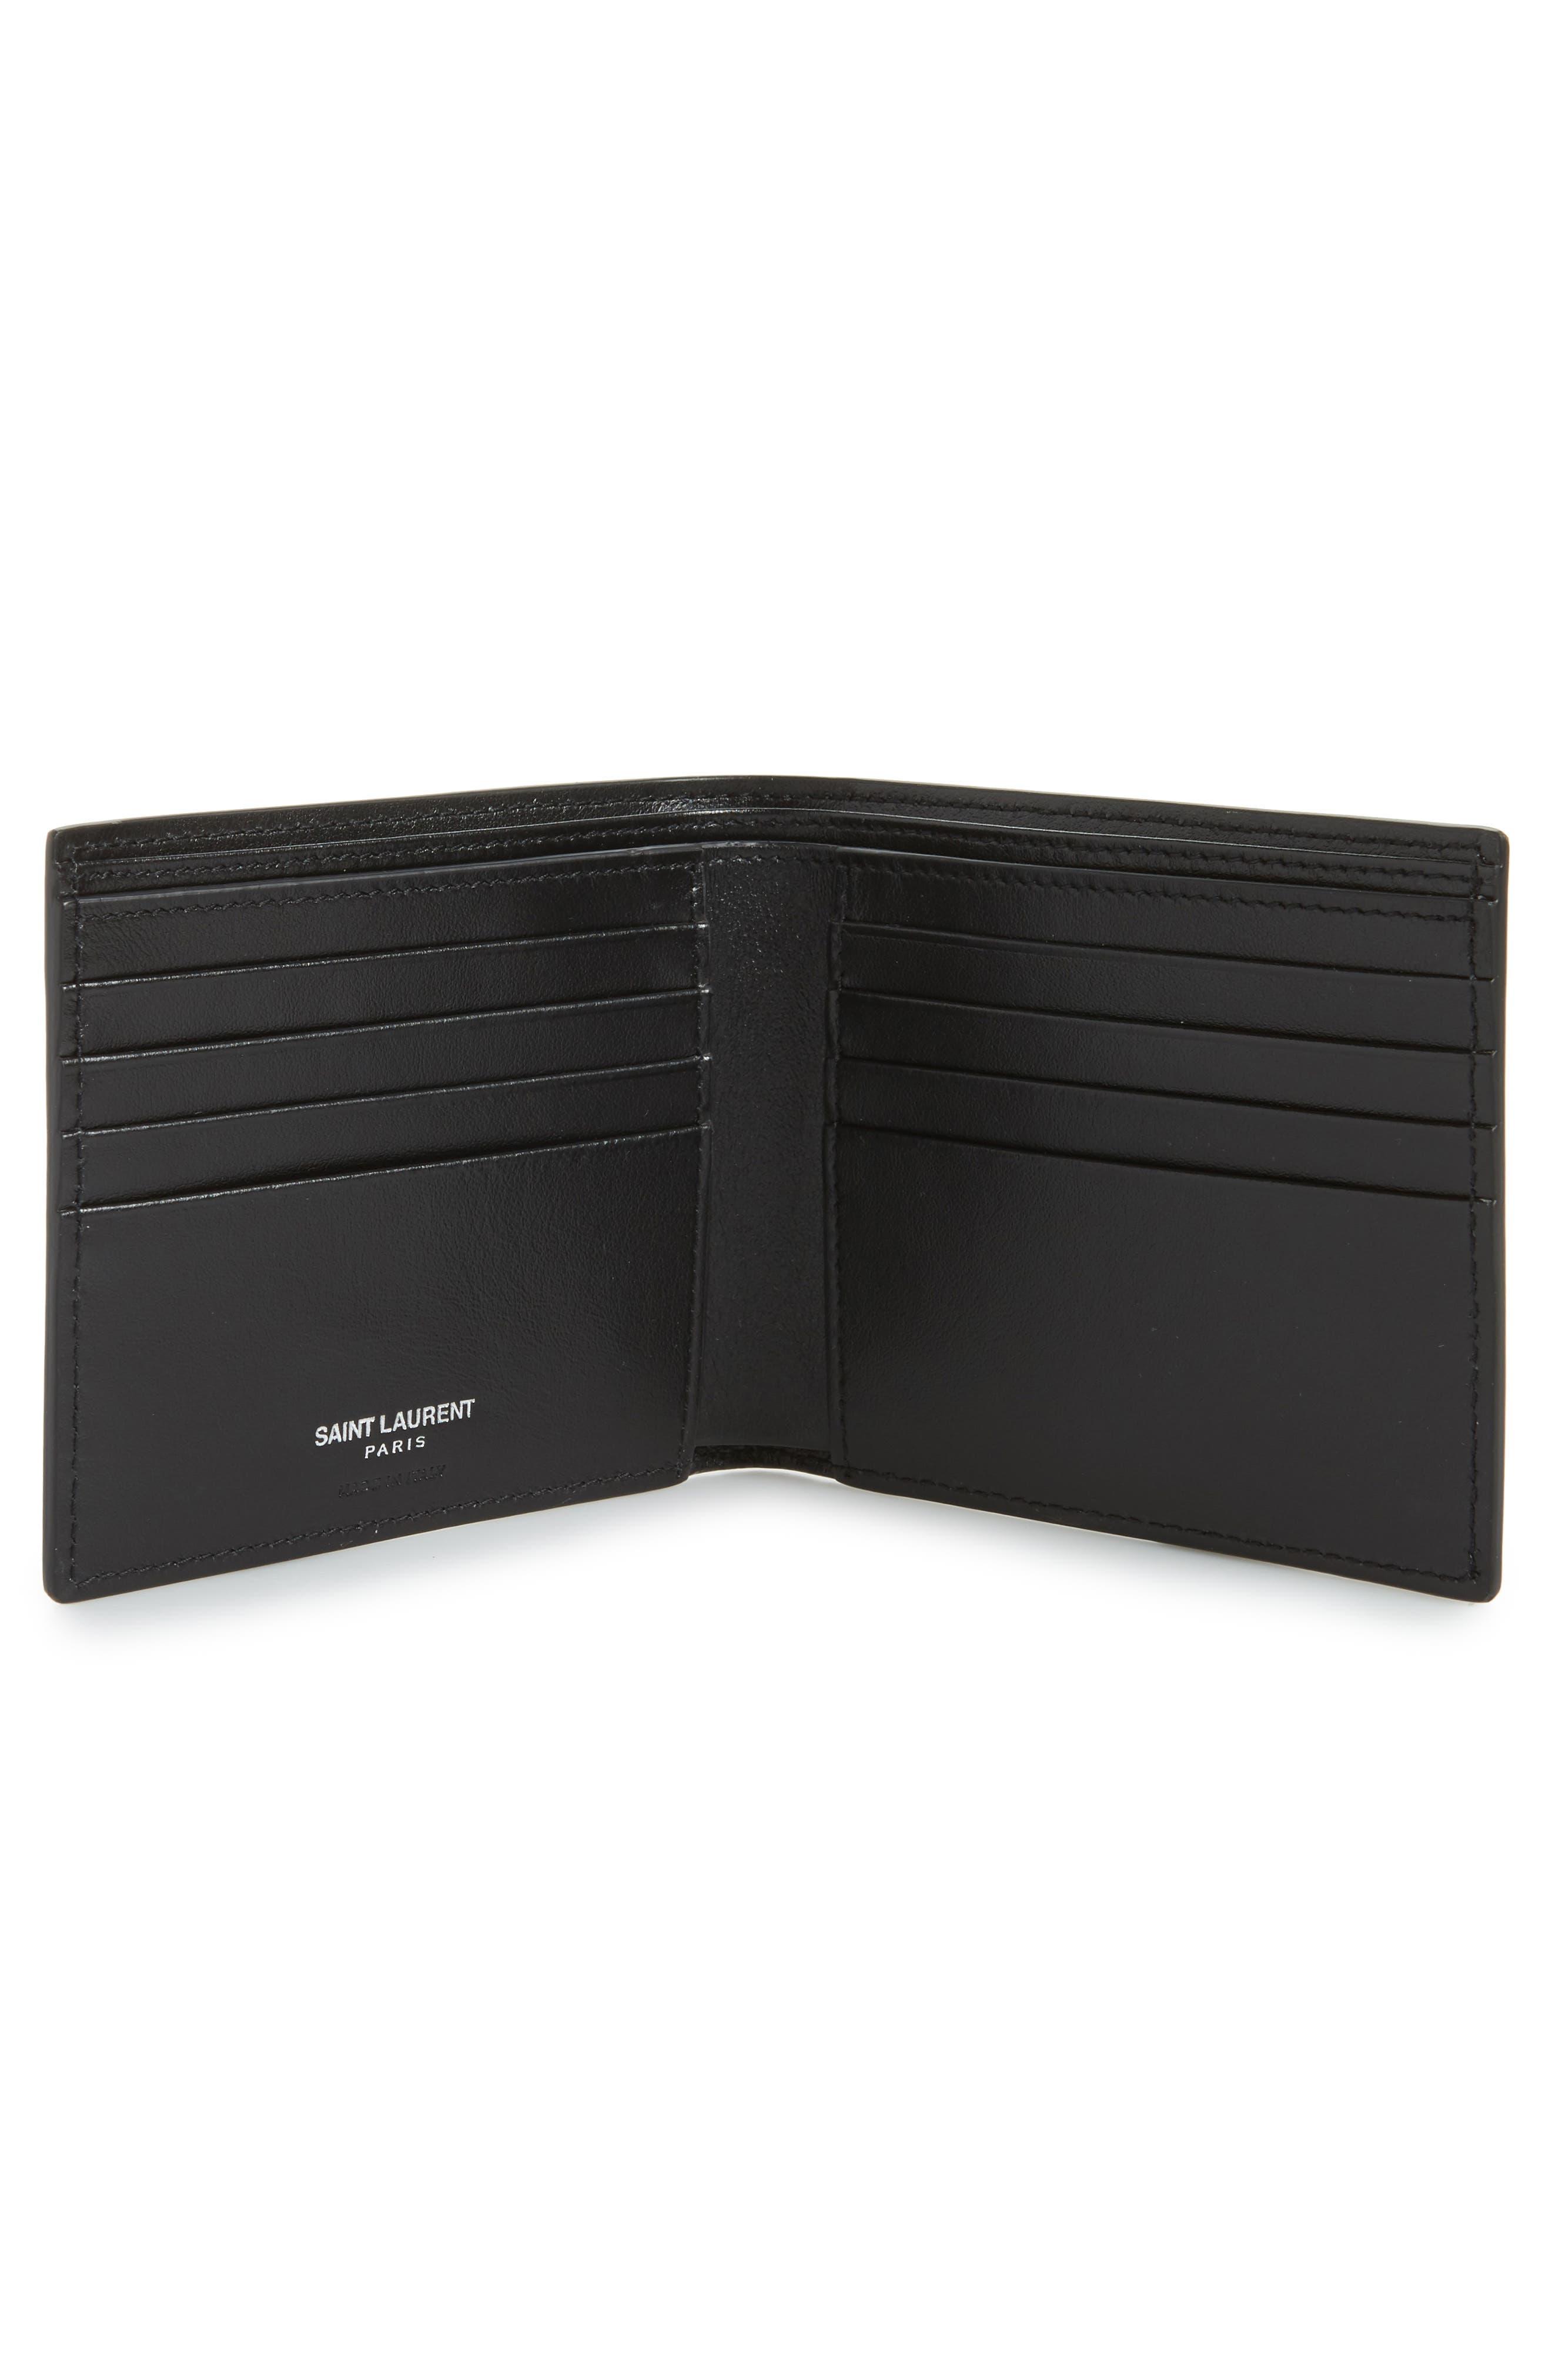 East/West Leather Wallet,                             Alternate thumbnail 2, color,                             Black